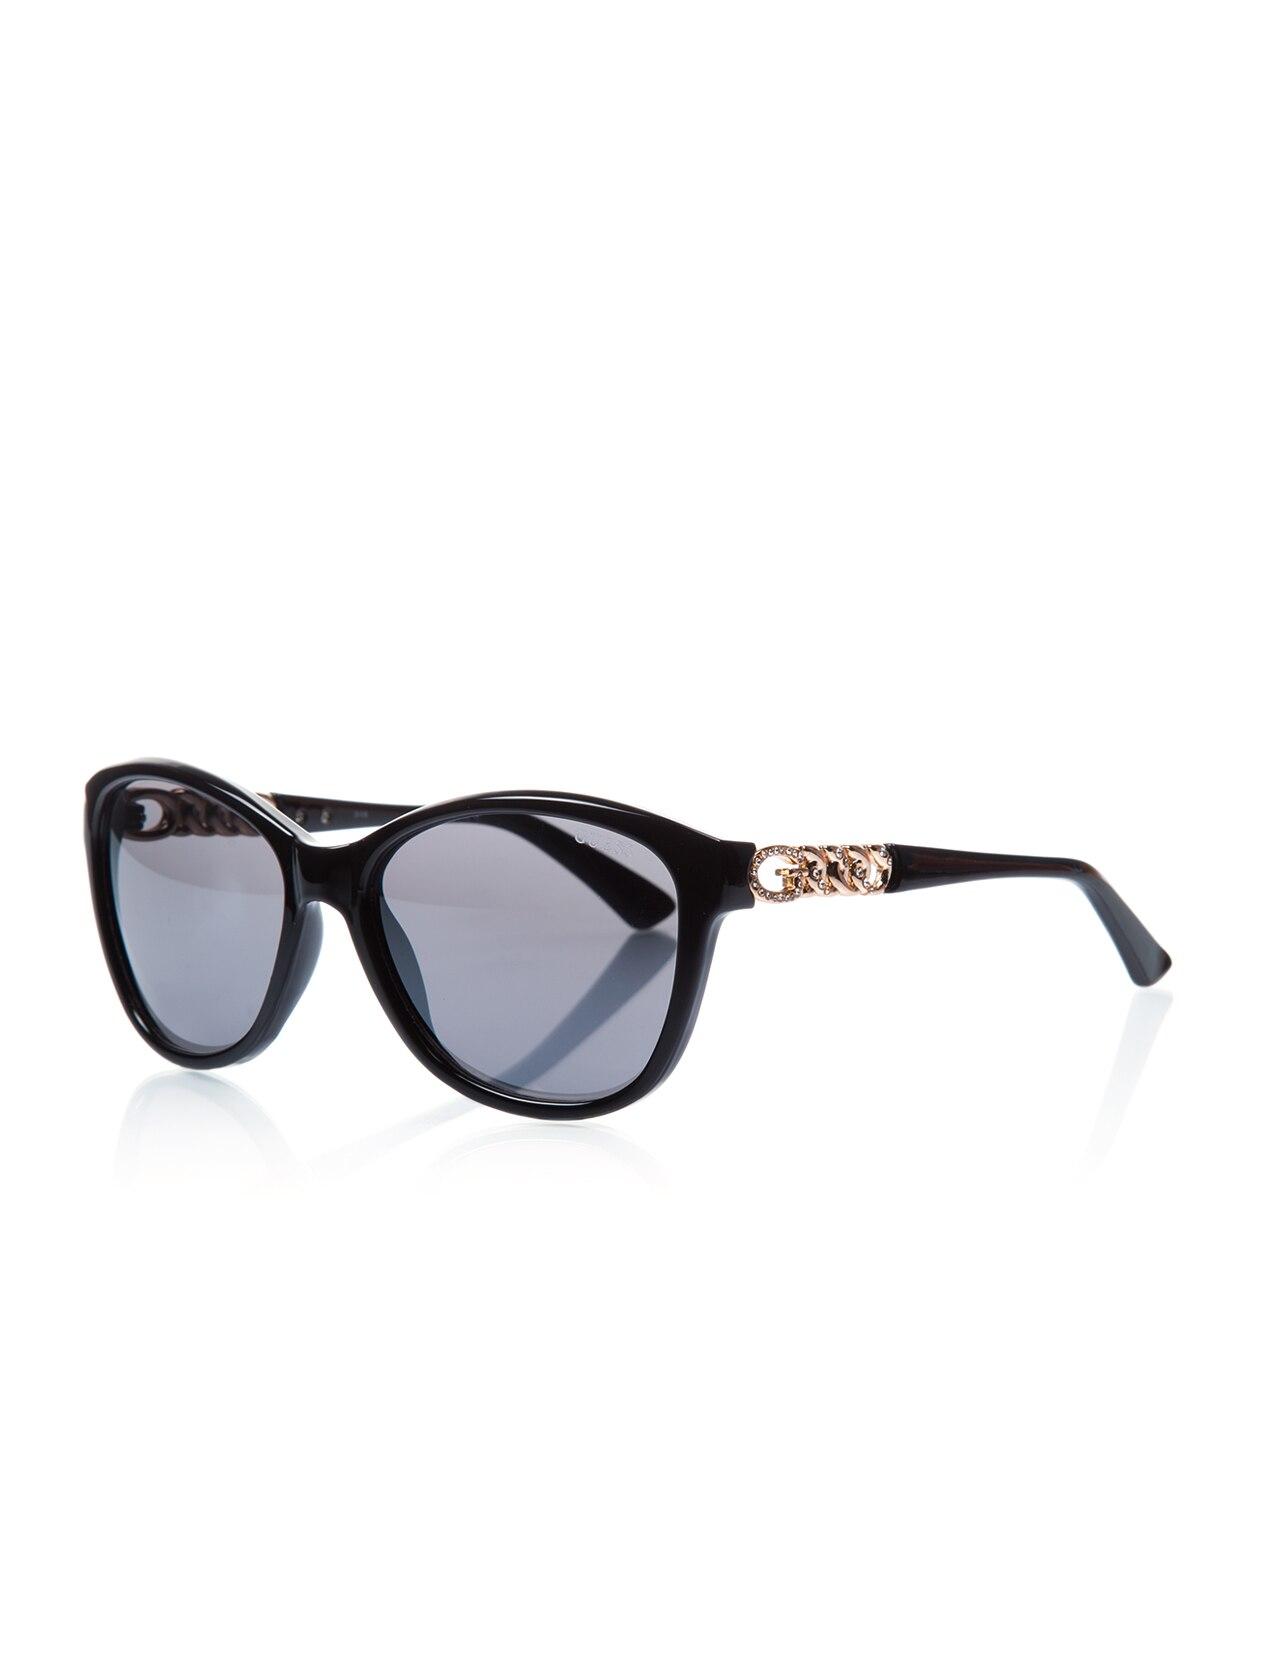 Women's sunglasses gu 7451 01c bone black organic 58-guess